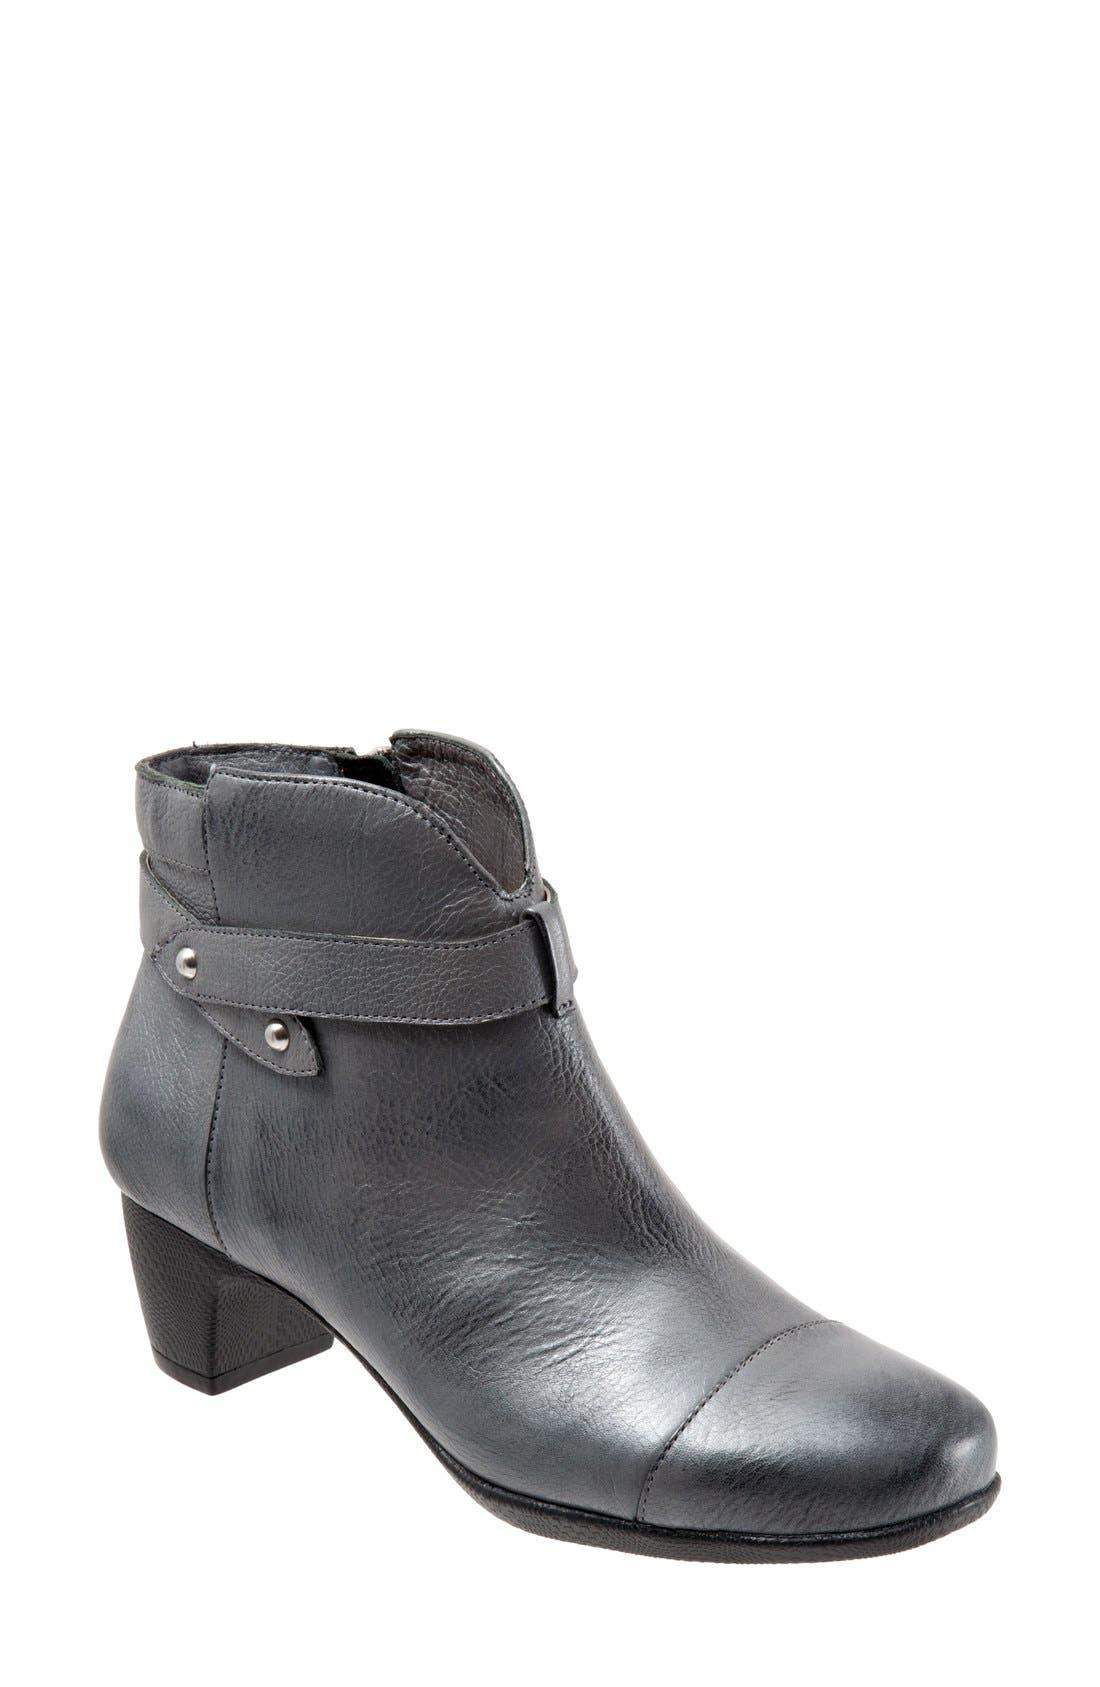 SOFTWALK® 'Ivanhoe' Leather Bootie